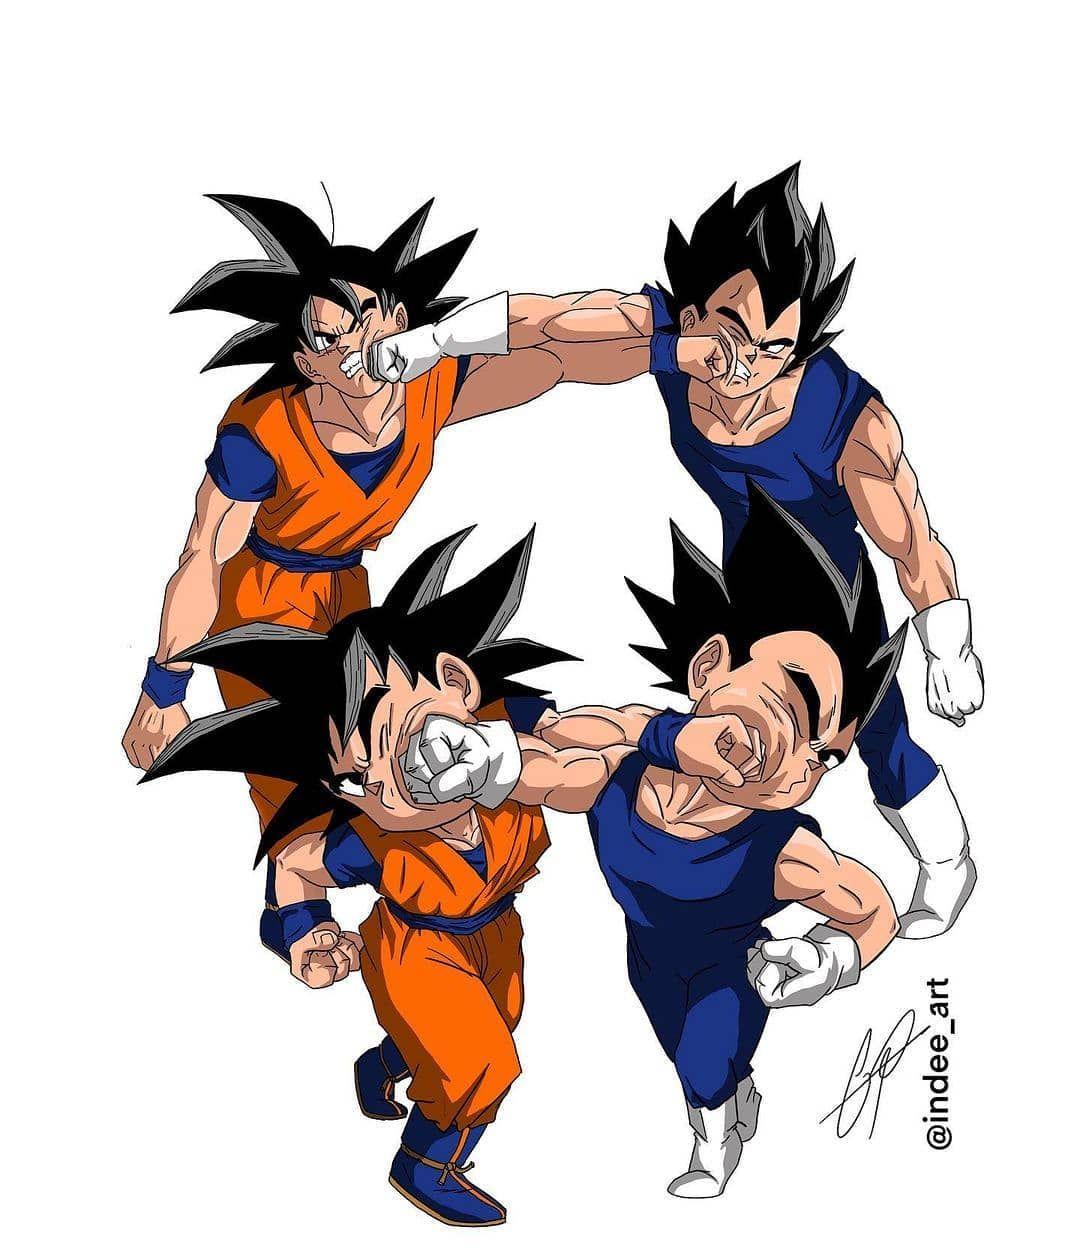 Eternal Rivalry By Artist Vegeta Teamvegeta Vegetafans Goku Dragonball